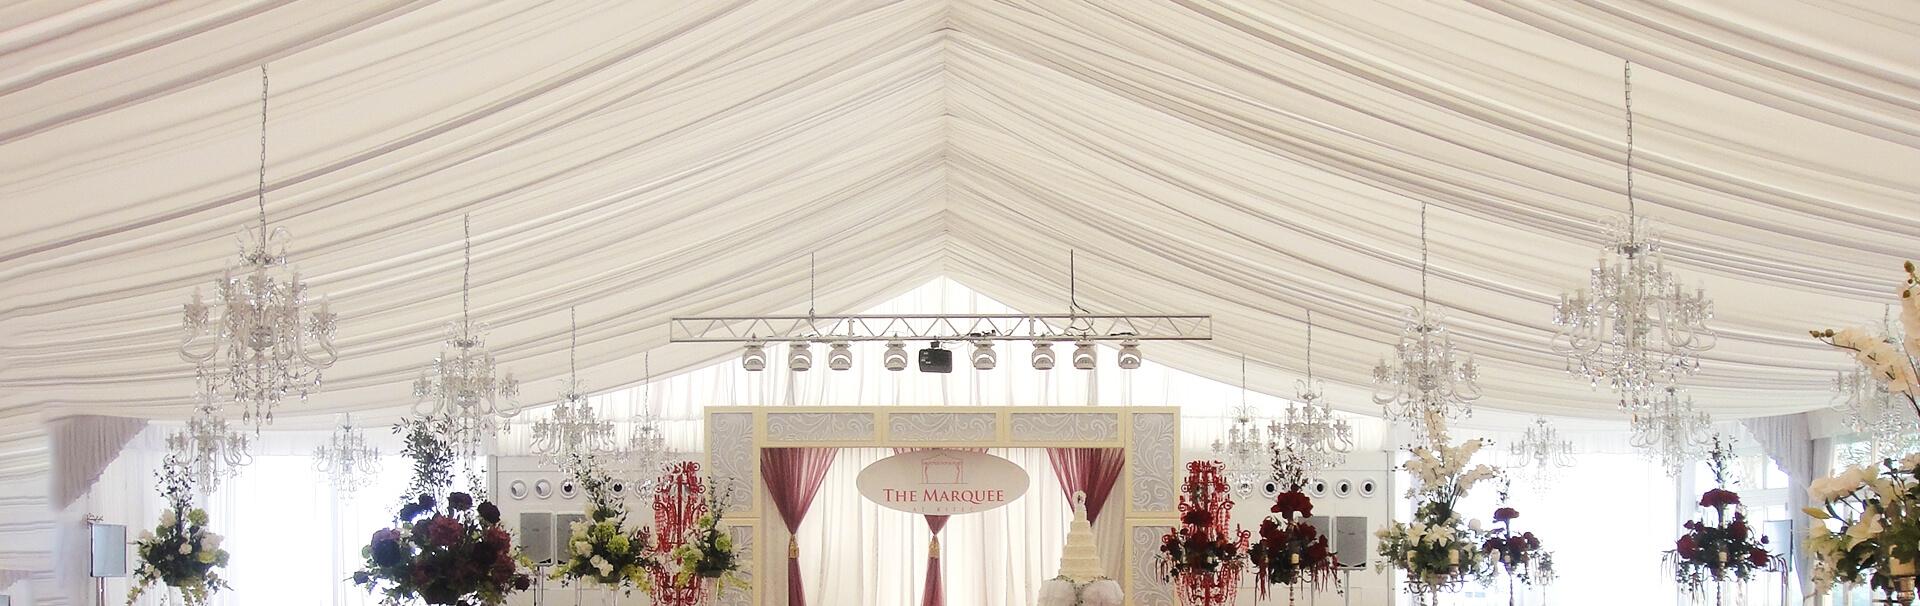 Duocai Tent (@dctent) Cover Image